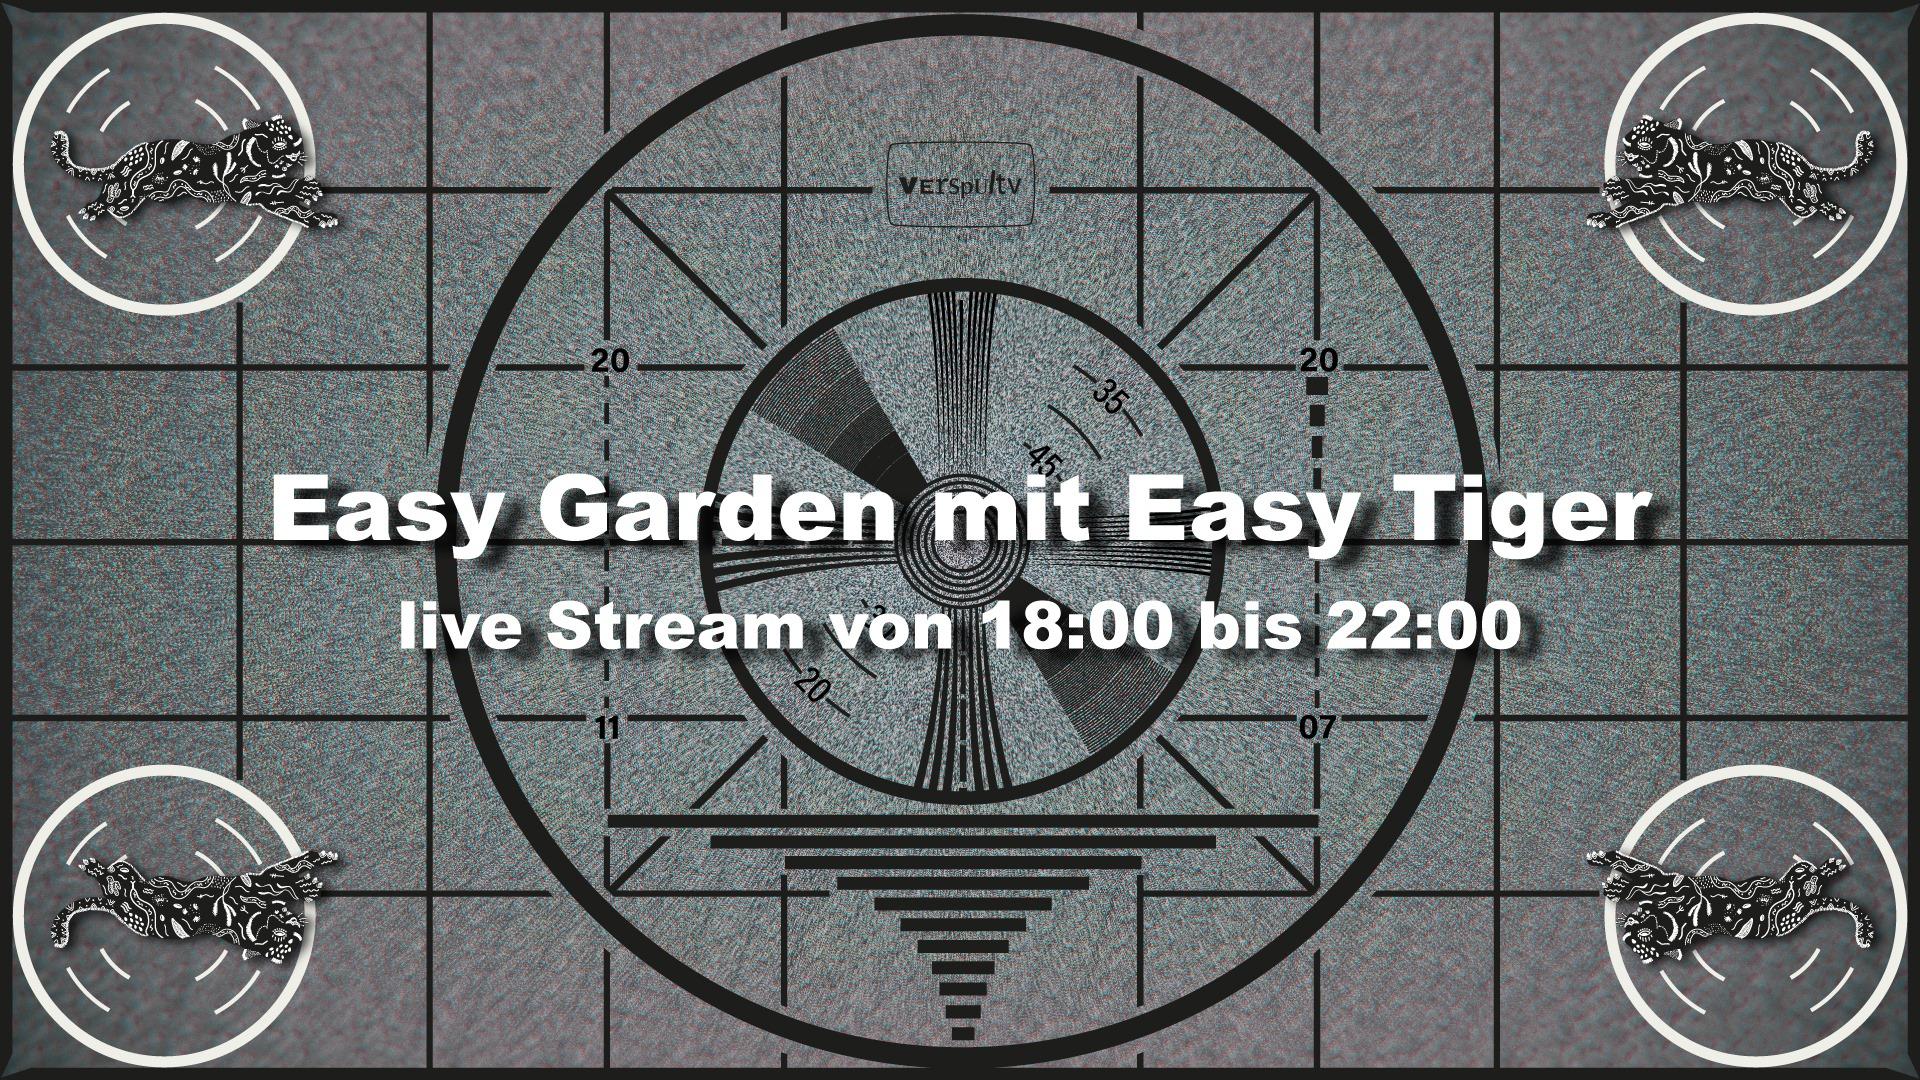 Easy Garden 11072020